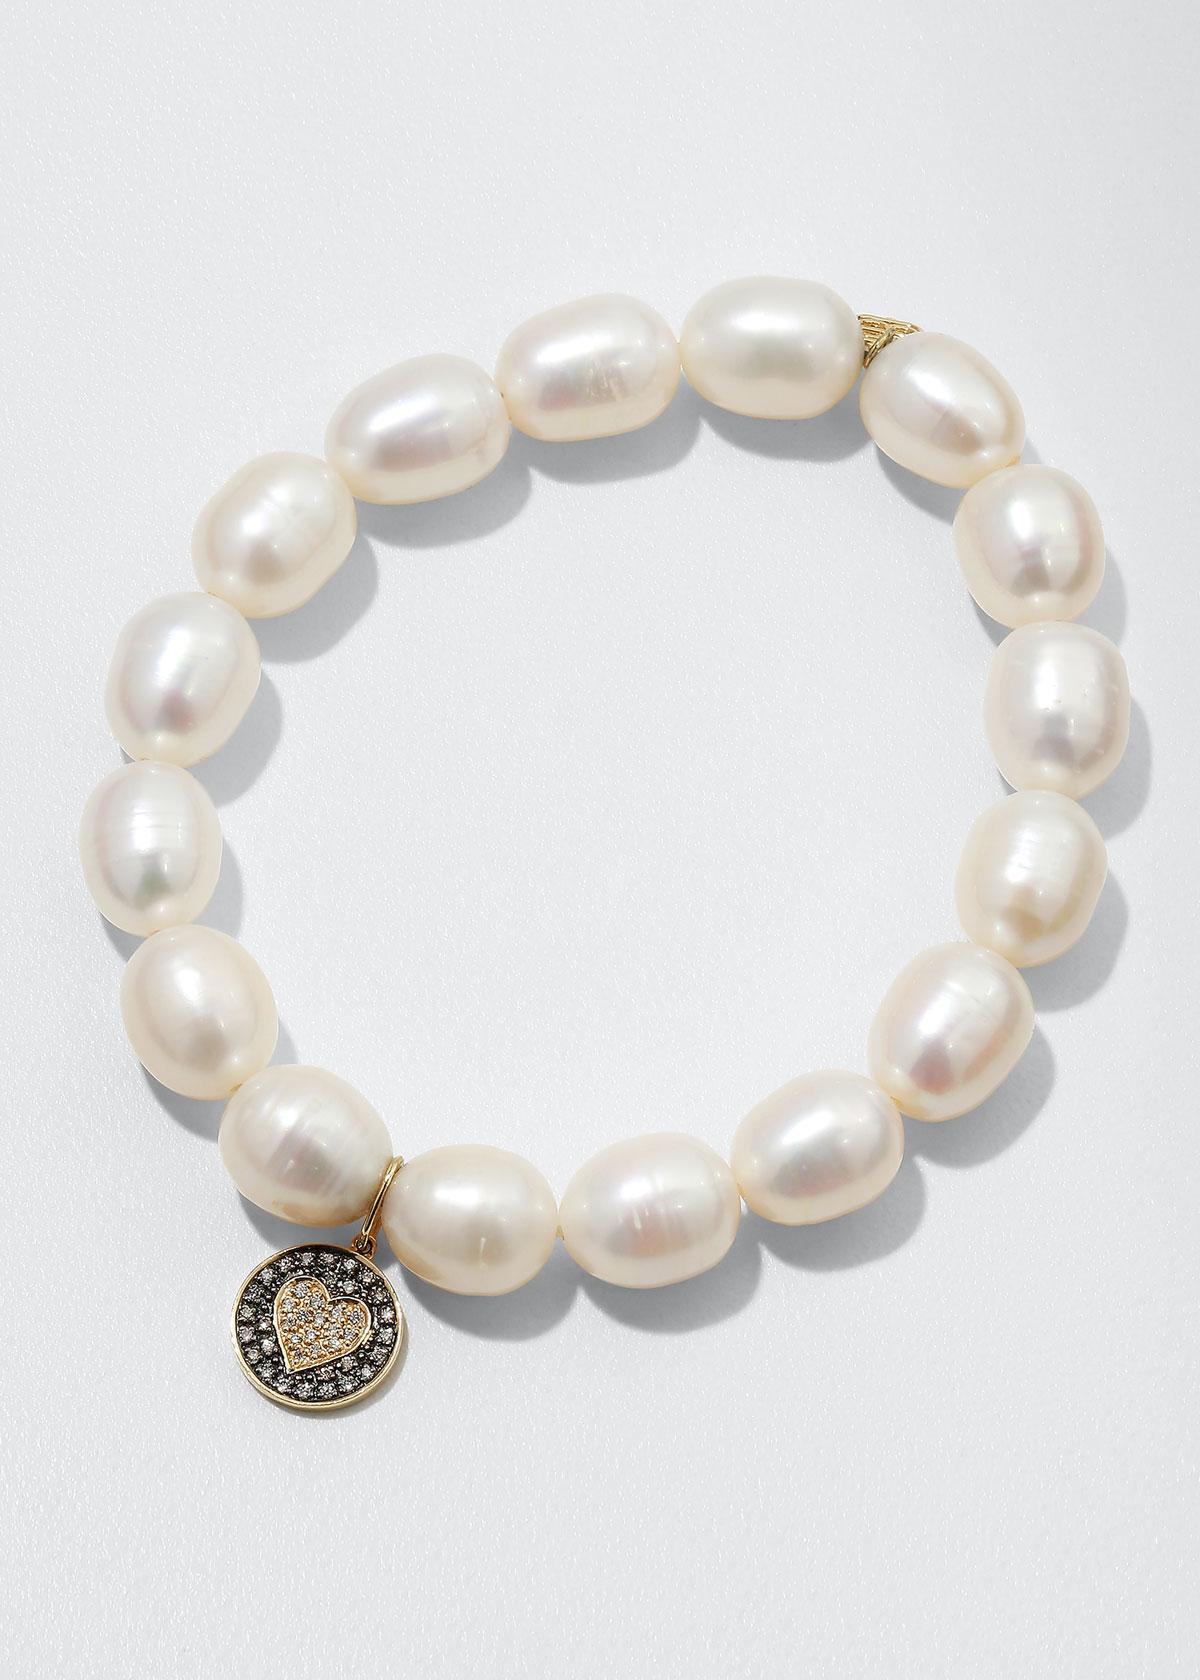 9Mm Pearl & Diamond Heart Bracelet in White